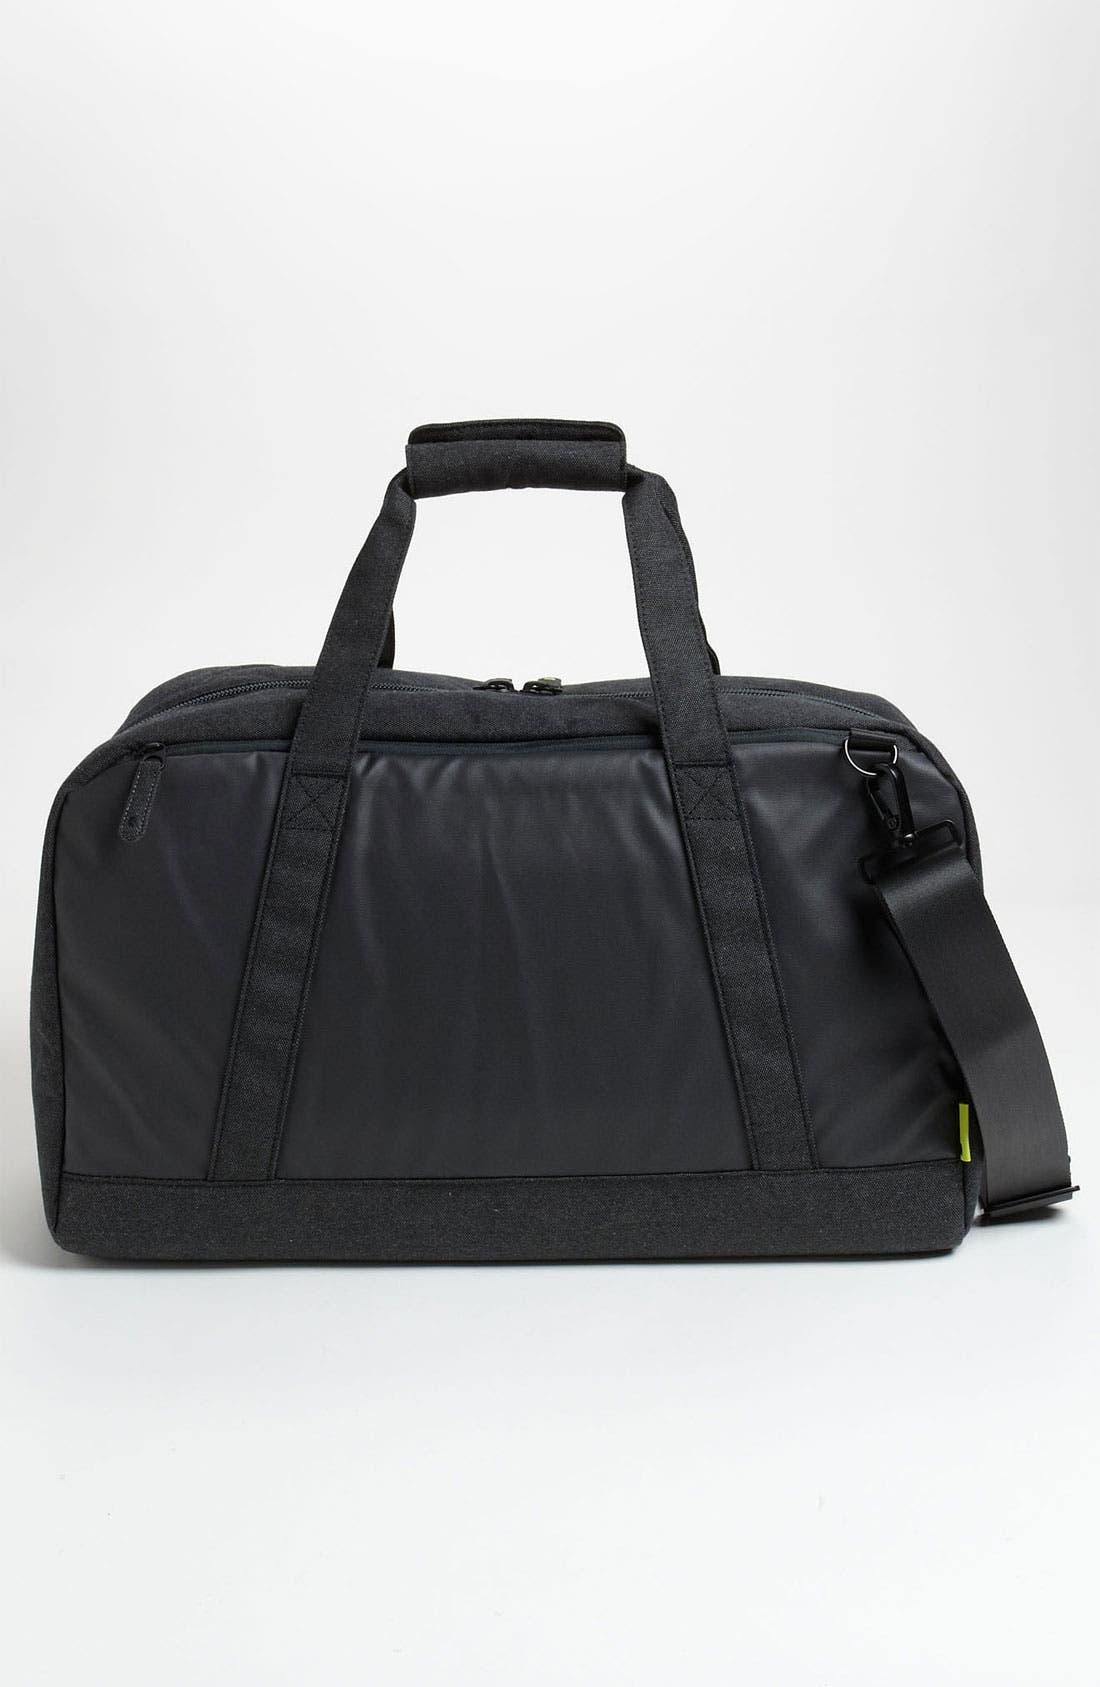 Incase 'EO' Travel Duffel Bag,                             Alternate thumbnail 3, color,                             001